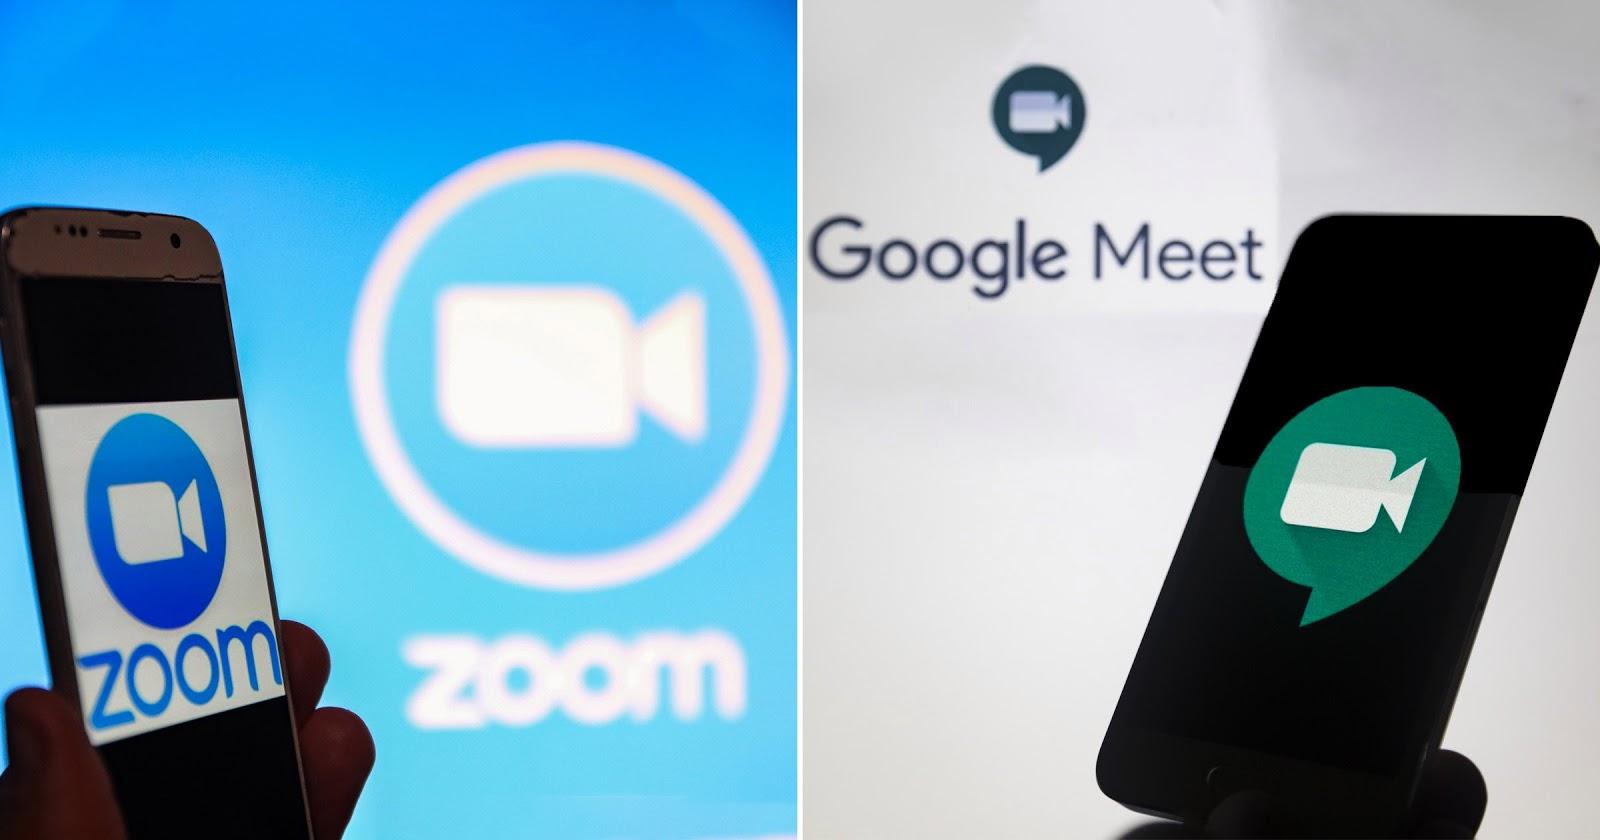 Google Meet ฟีเจอร์ใหม่